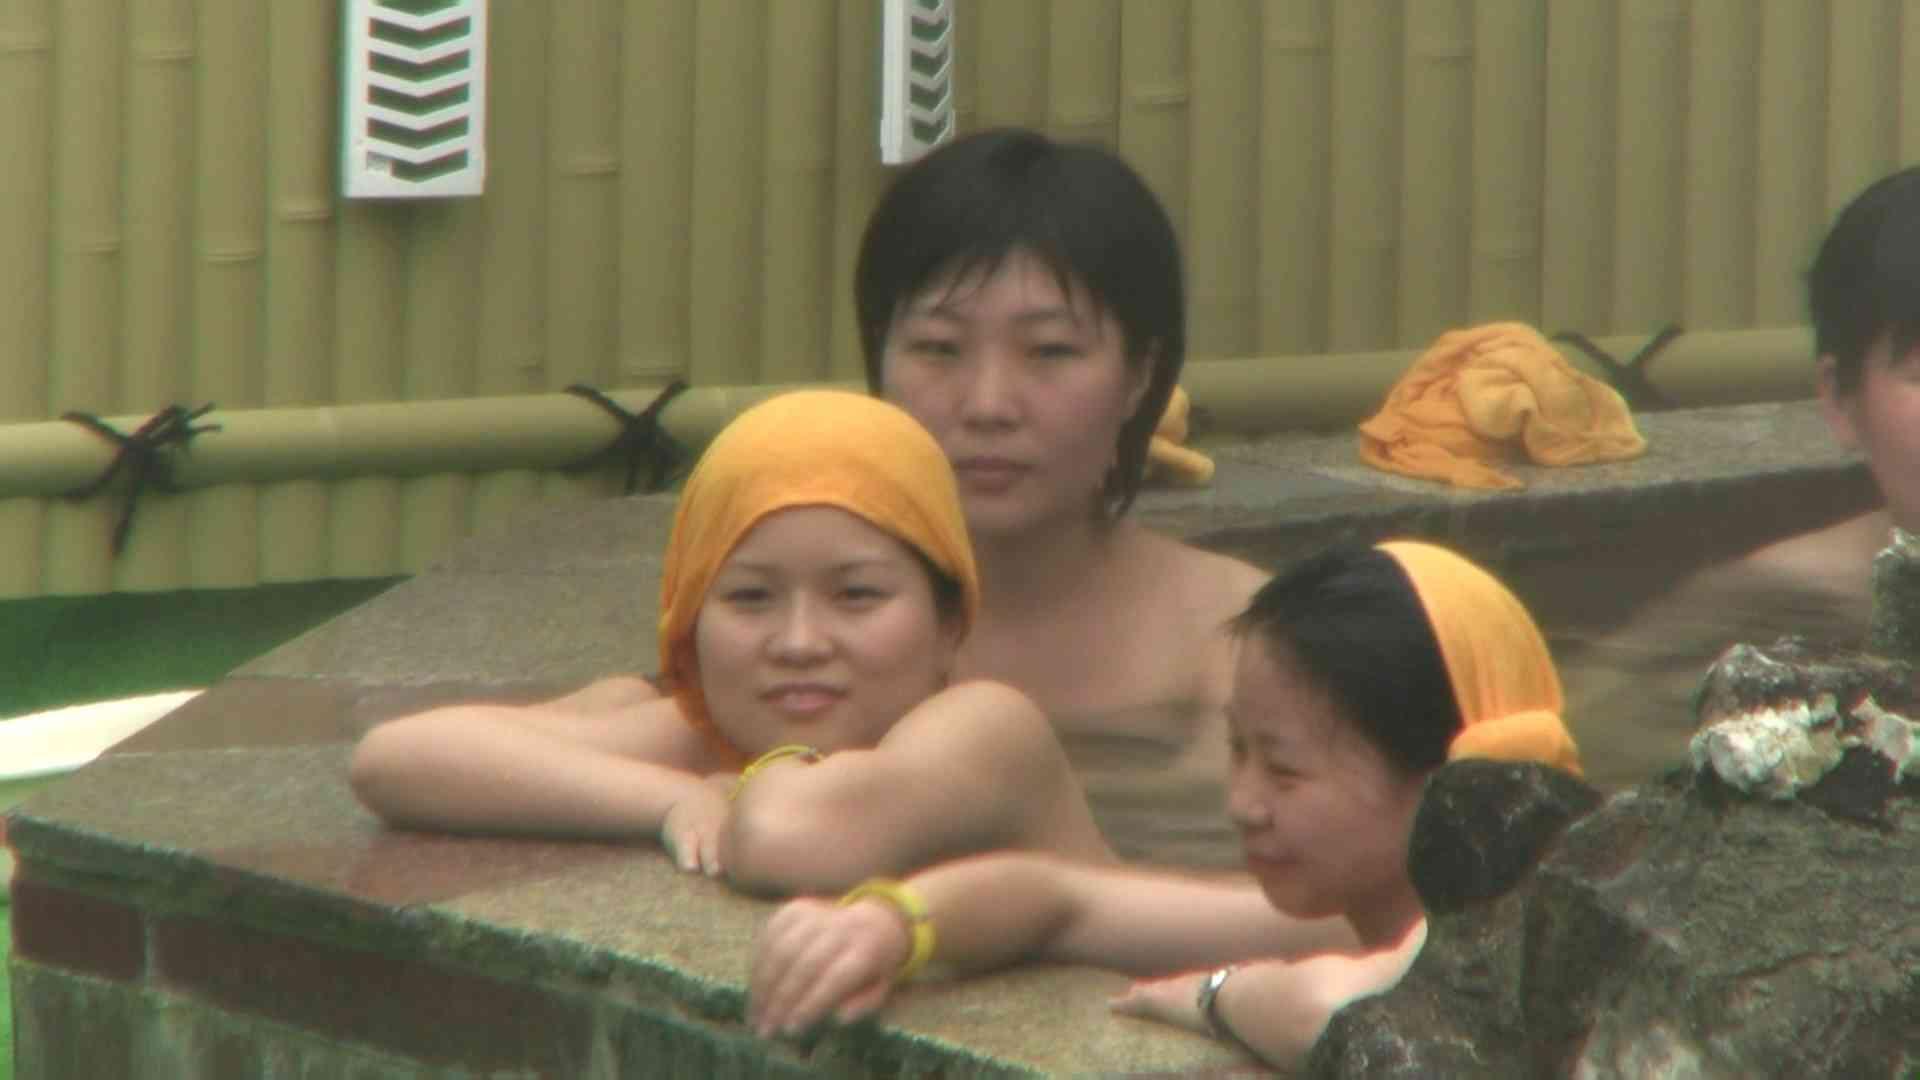 Aquaな露天風呂Vol.73【VIP限定】 盗撮 | HなOL  54pic 17